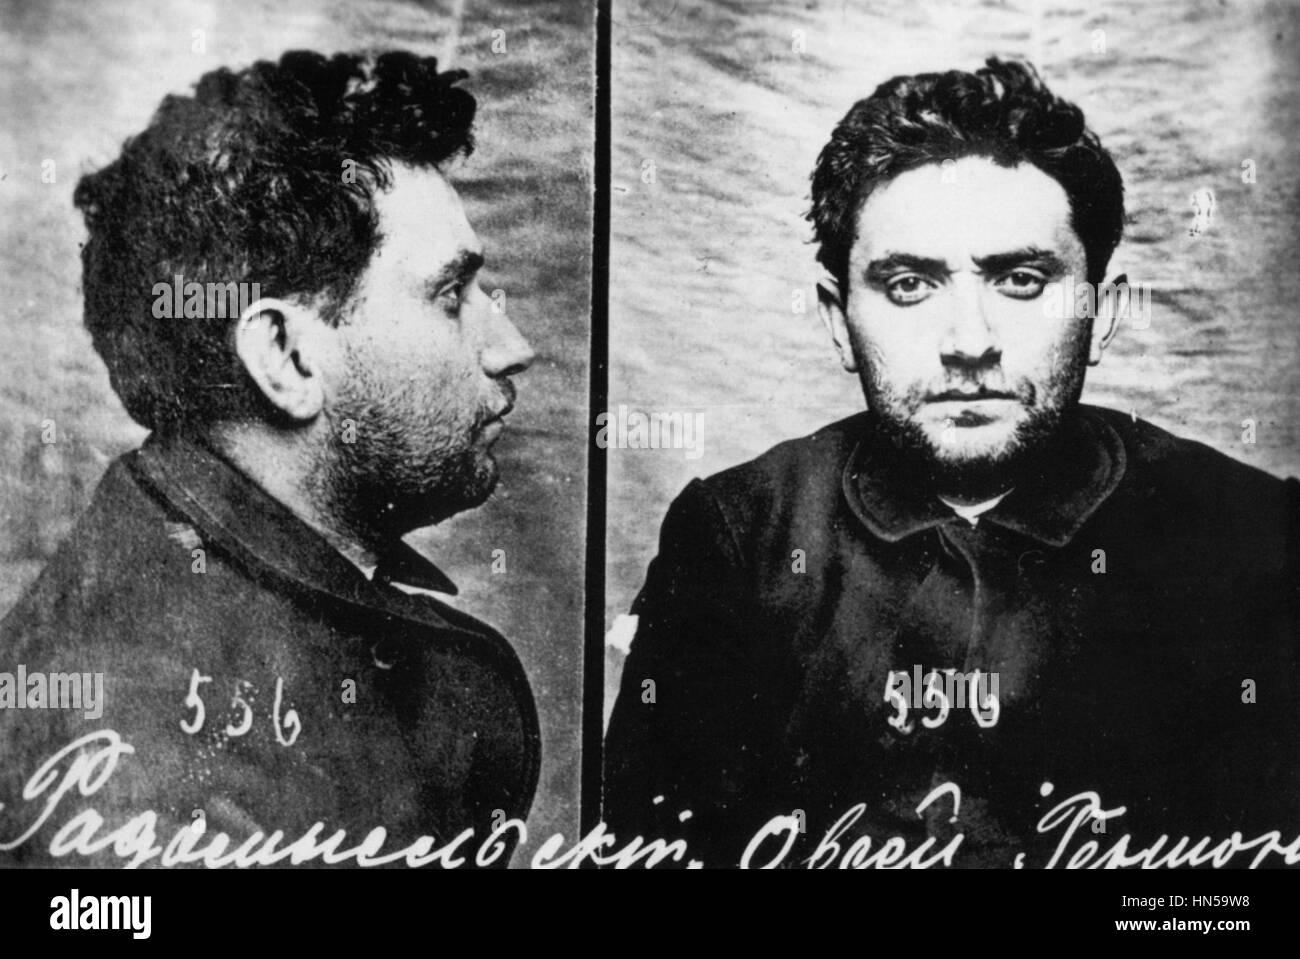 GRIGORY ZINOVIEV (1883-1936) Bolshevik revolutionary and Soviet Communist politician. Police photo after his arrest - Stock Image